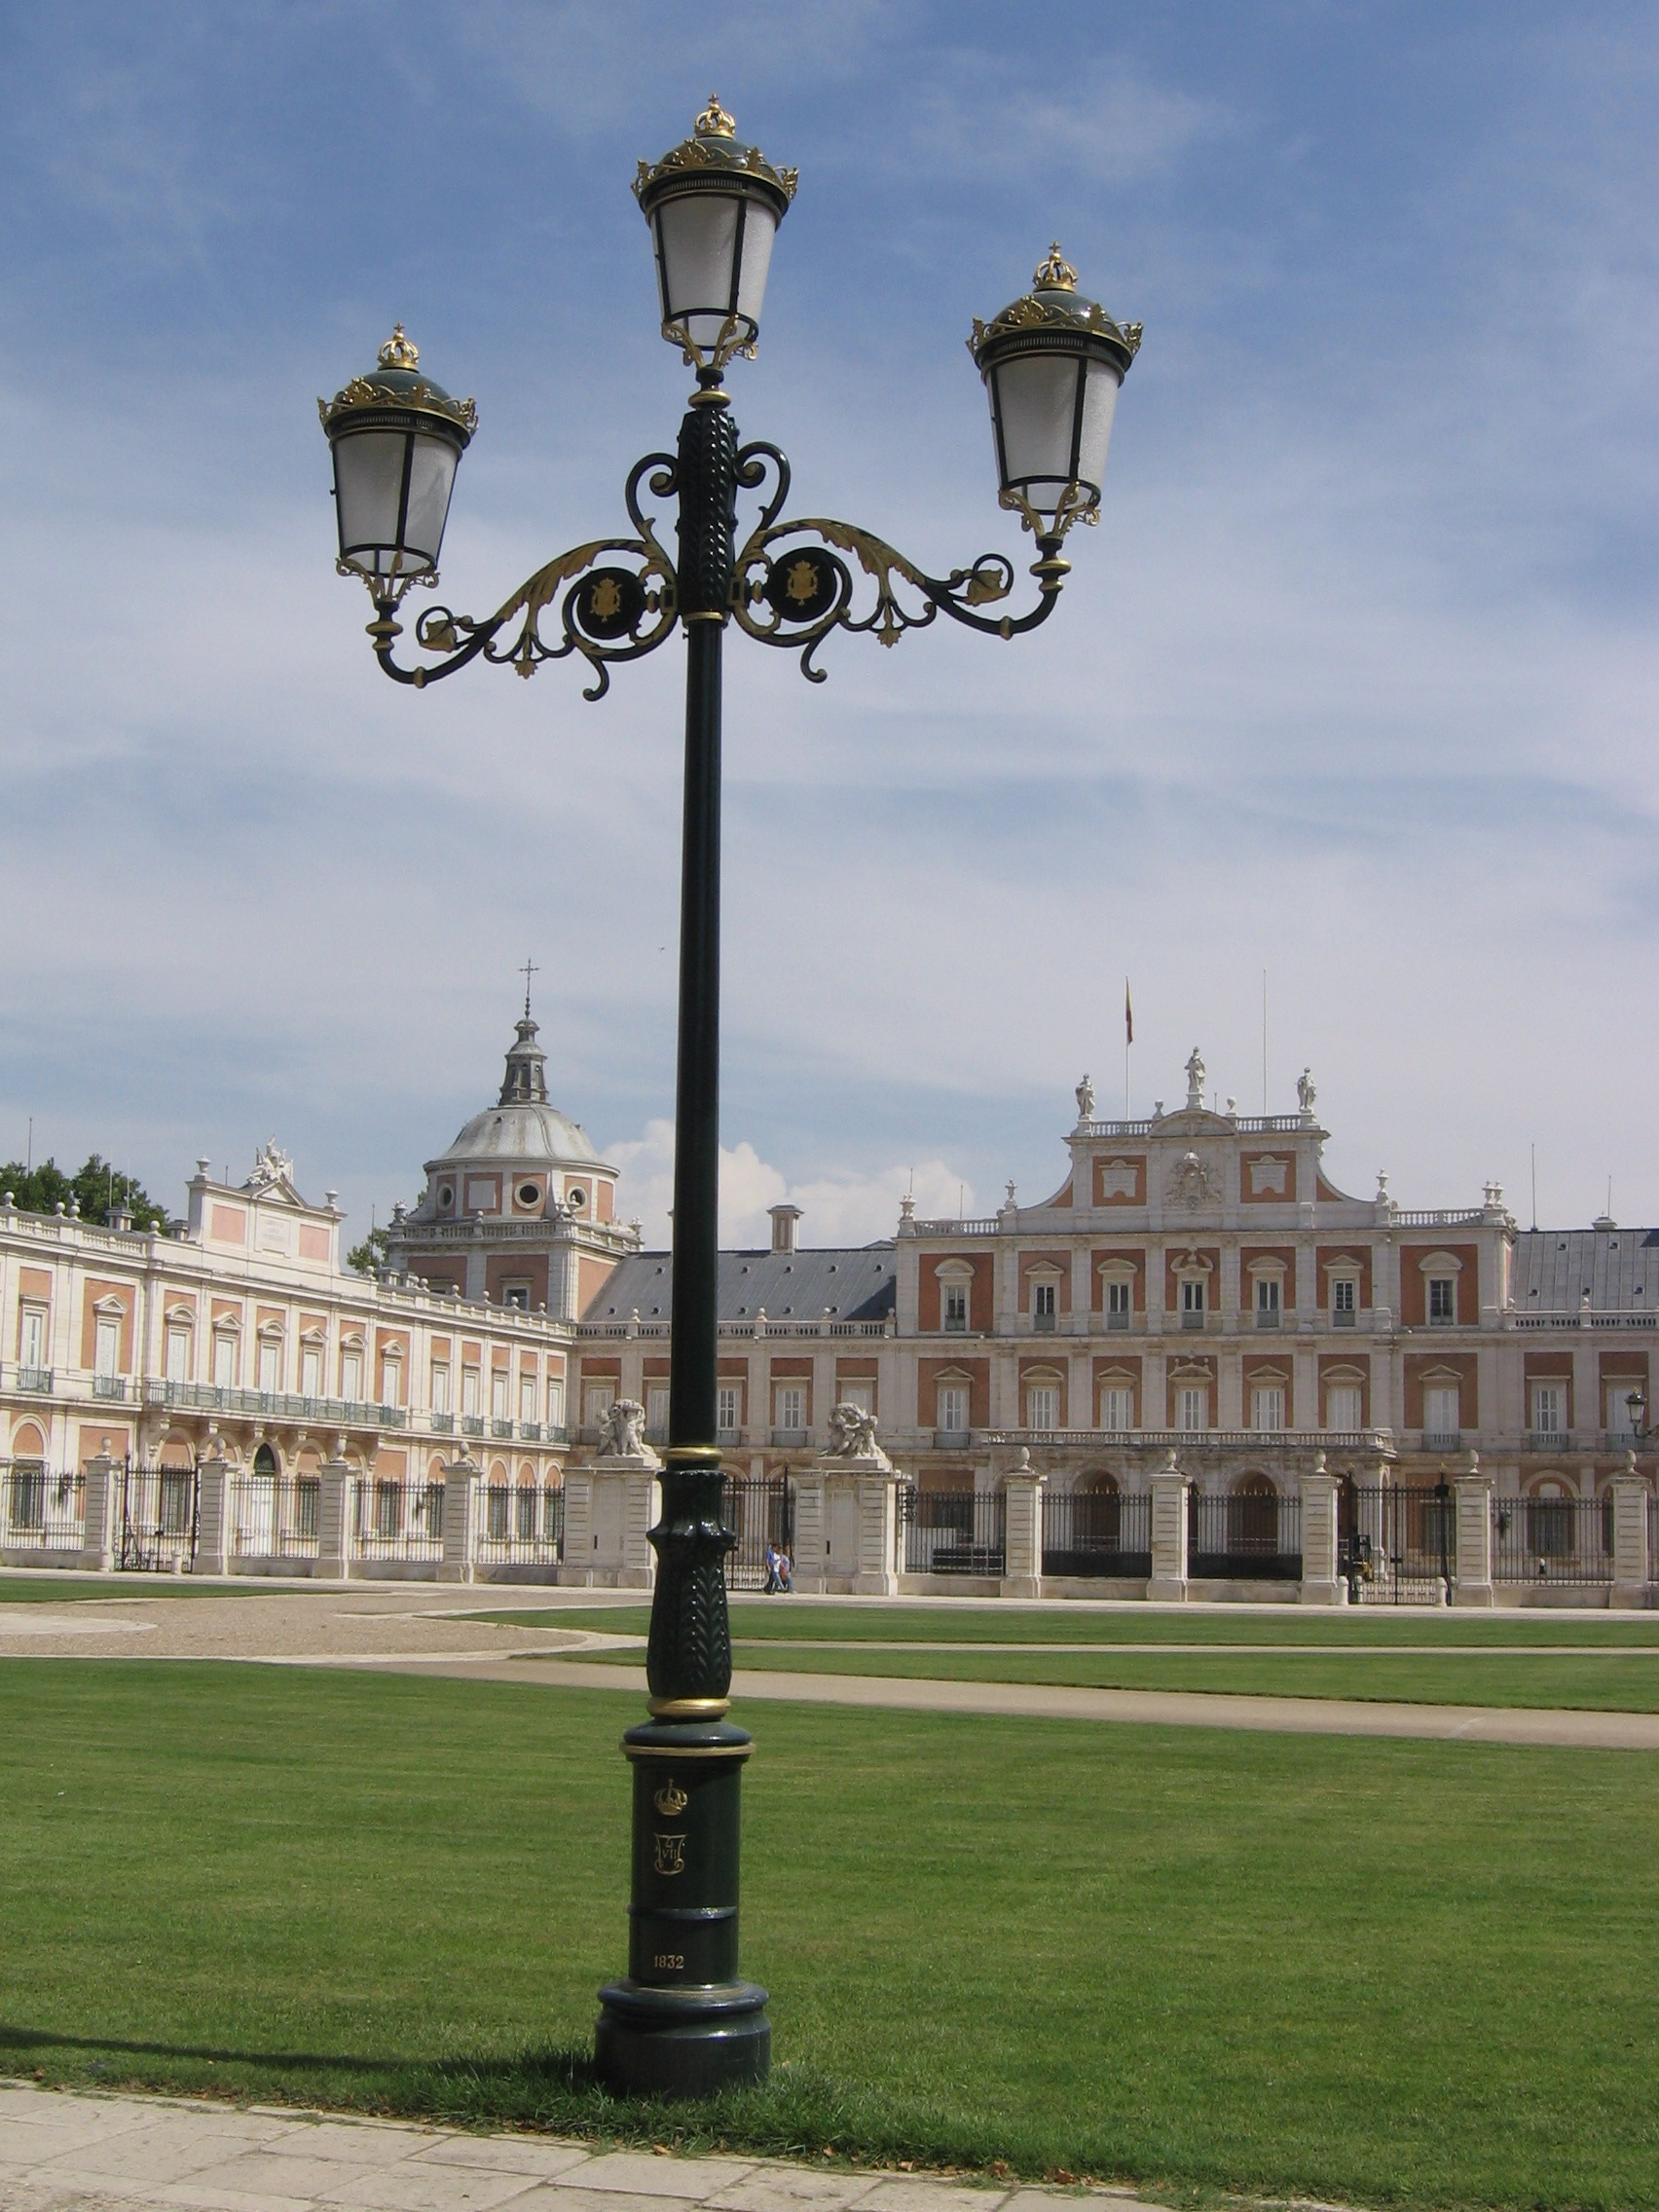 http://upload.wikimedia.org/wikipedia/commons/c/c8/Aranjuez_PalacioReal_Farola.jpg